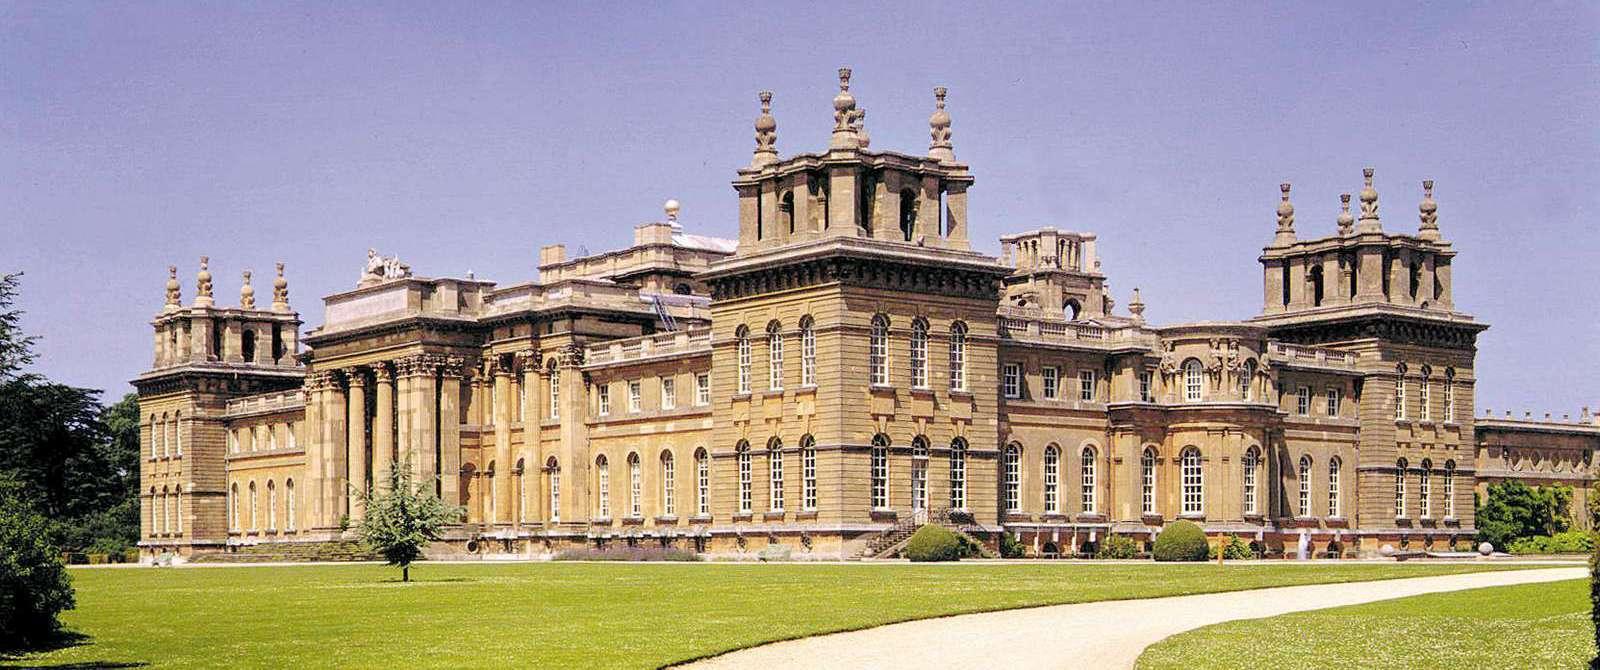 Hotels Near Blenheim Palace Oxford